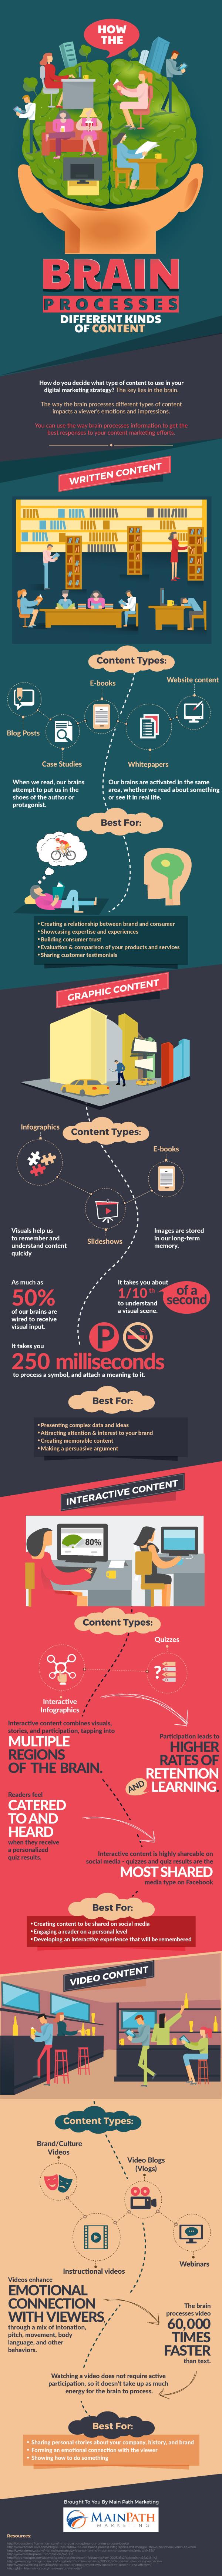 content_brain_infographic